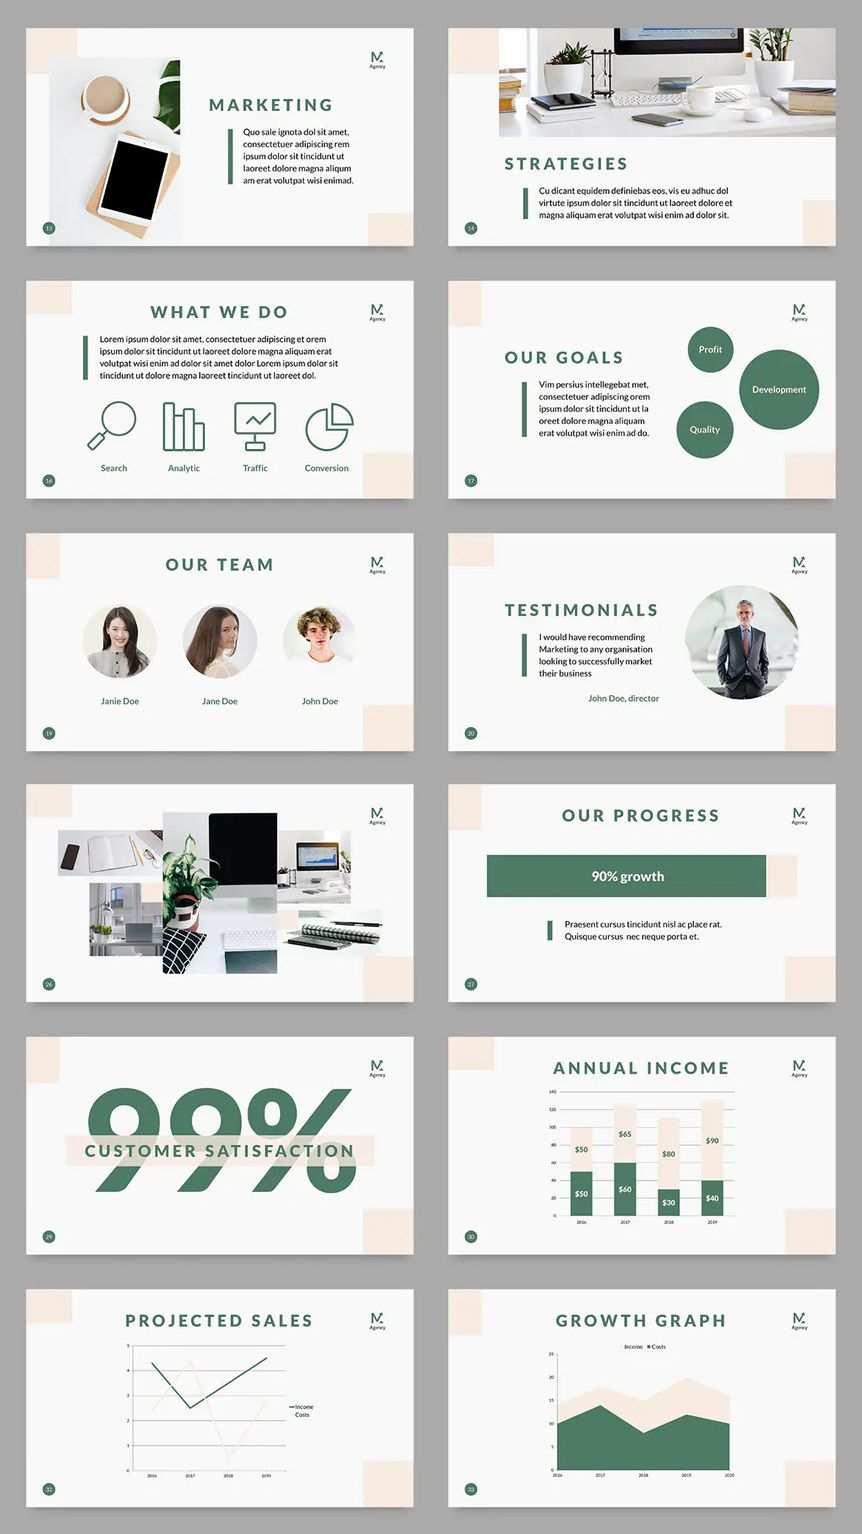 Digital Marketing Company Powerpoint Presentation Template 50